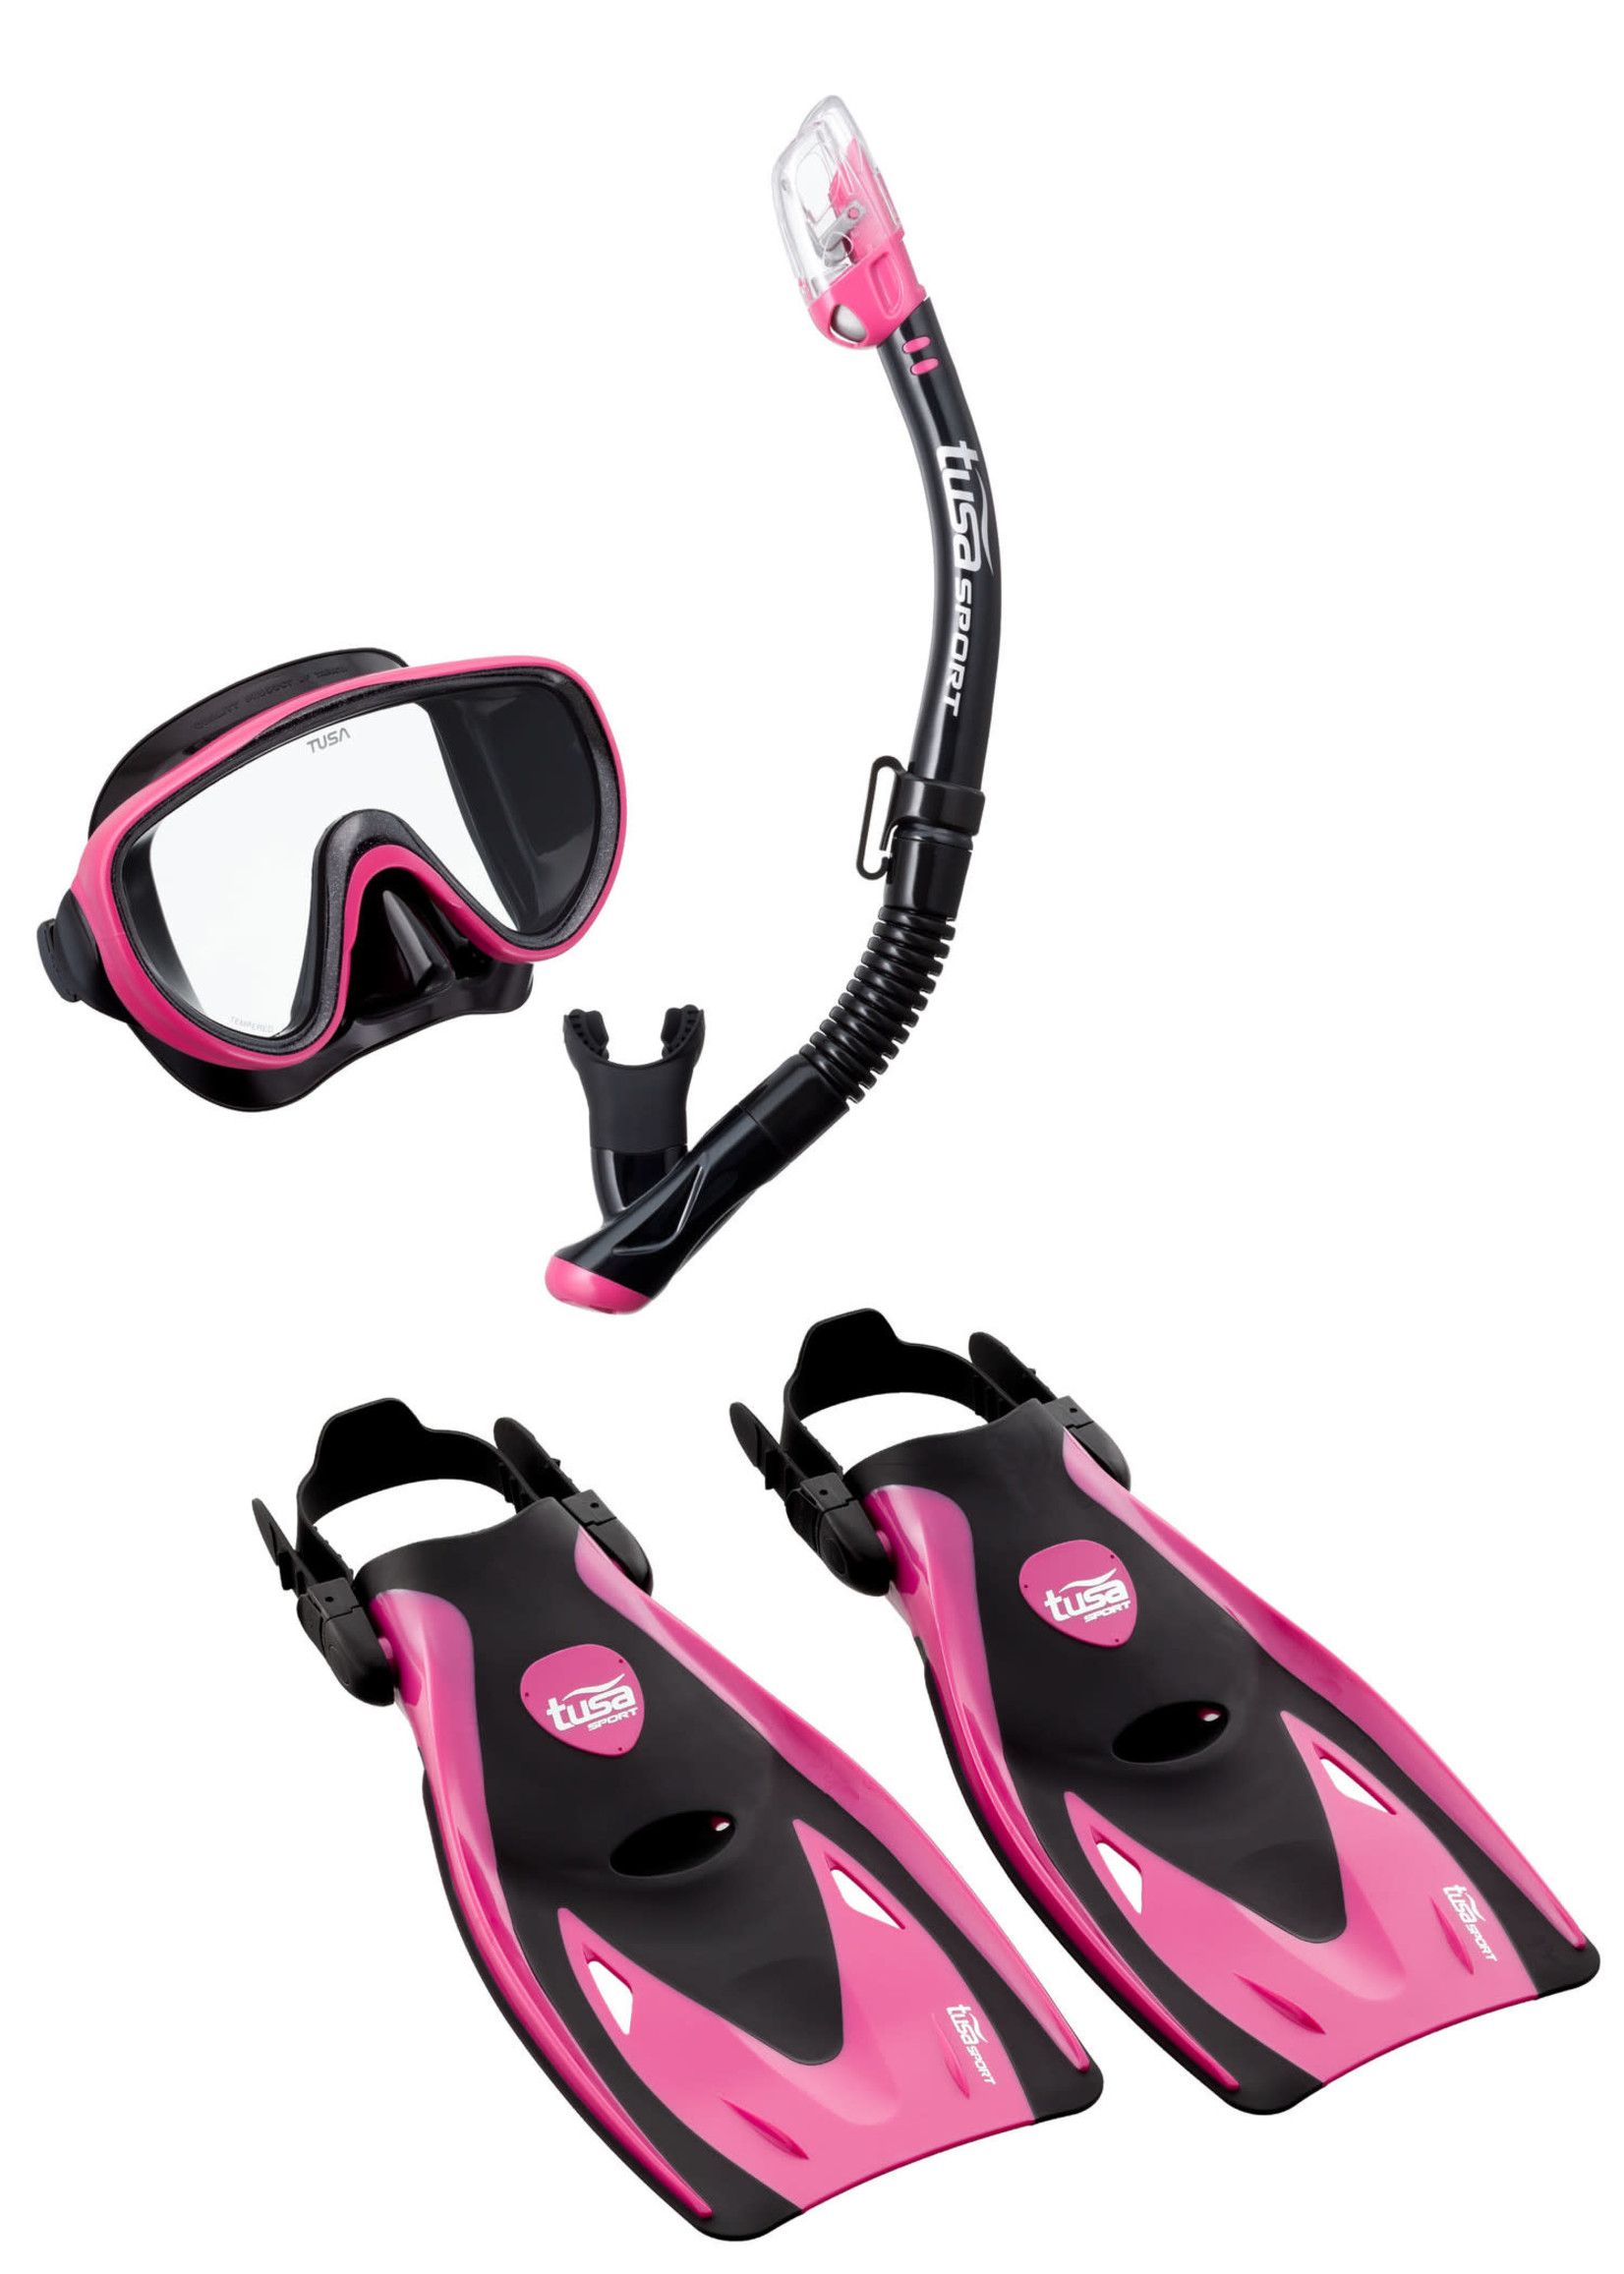 TUSA TUSA Serene Adult Travel Set - Black/Hot Pink